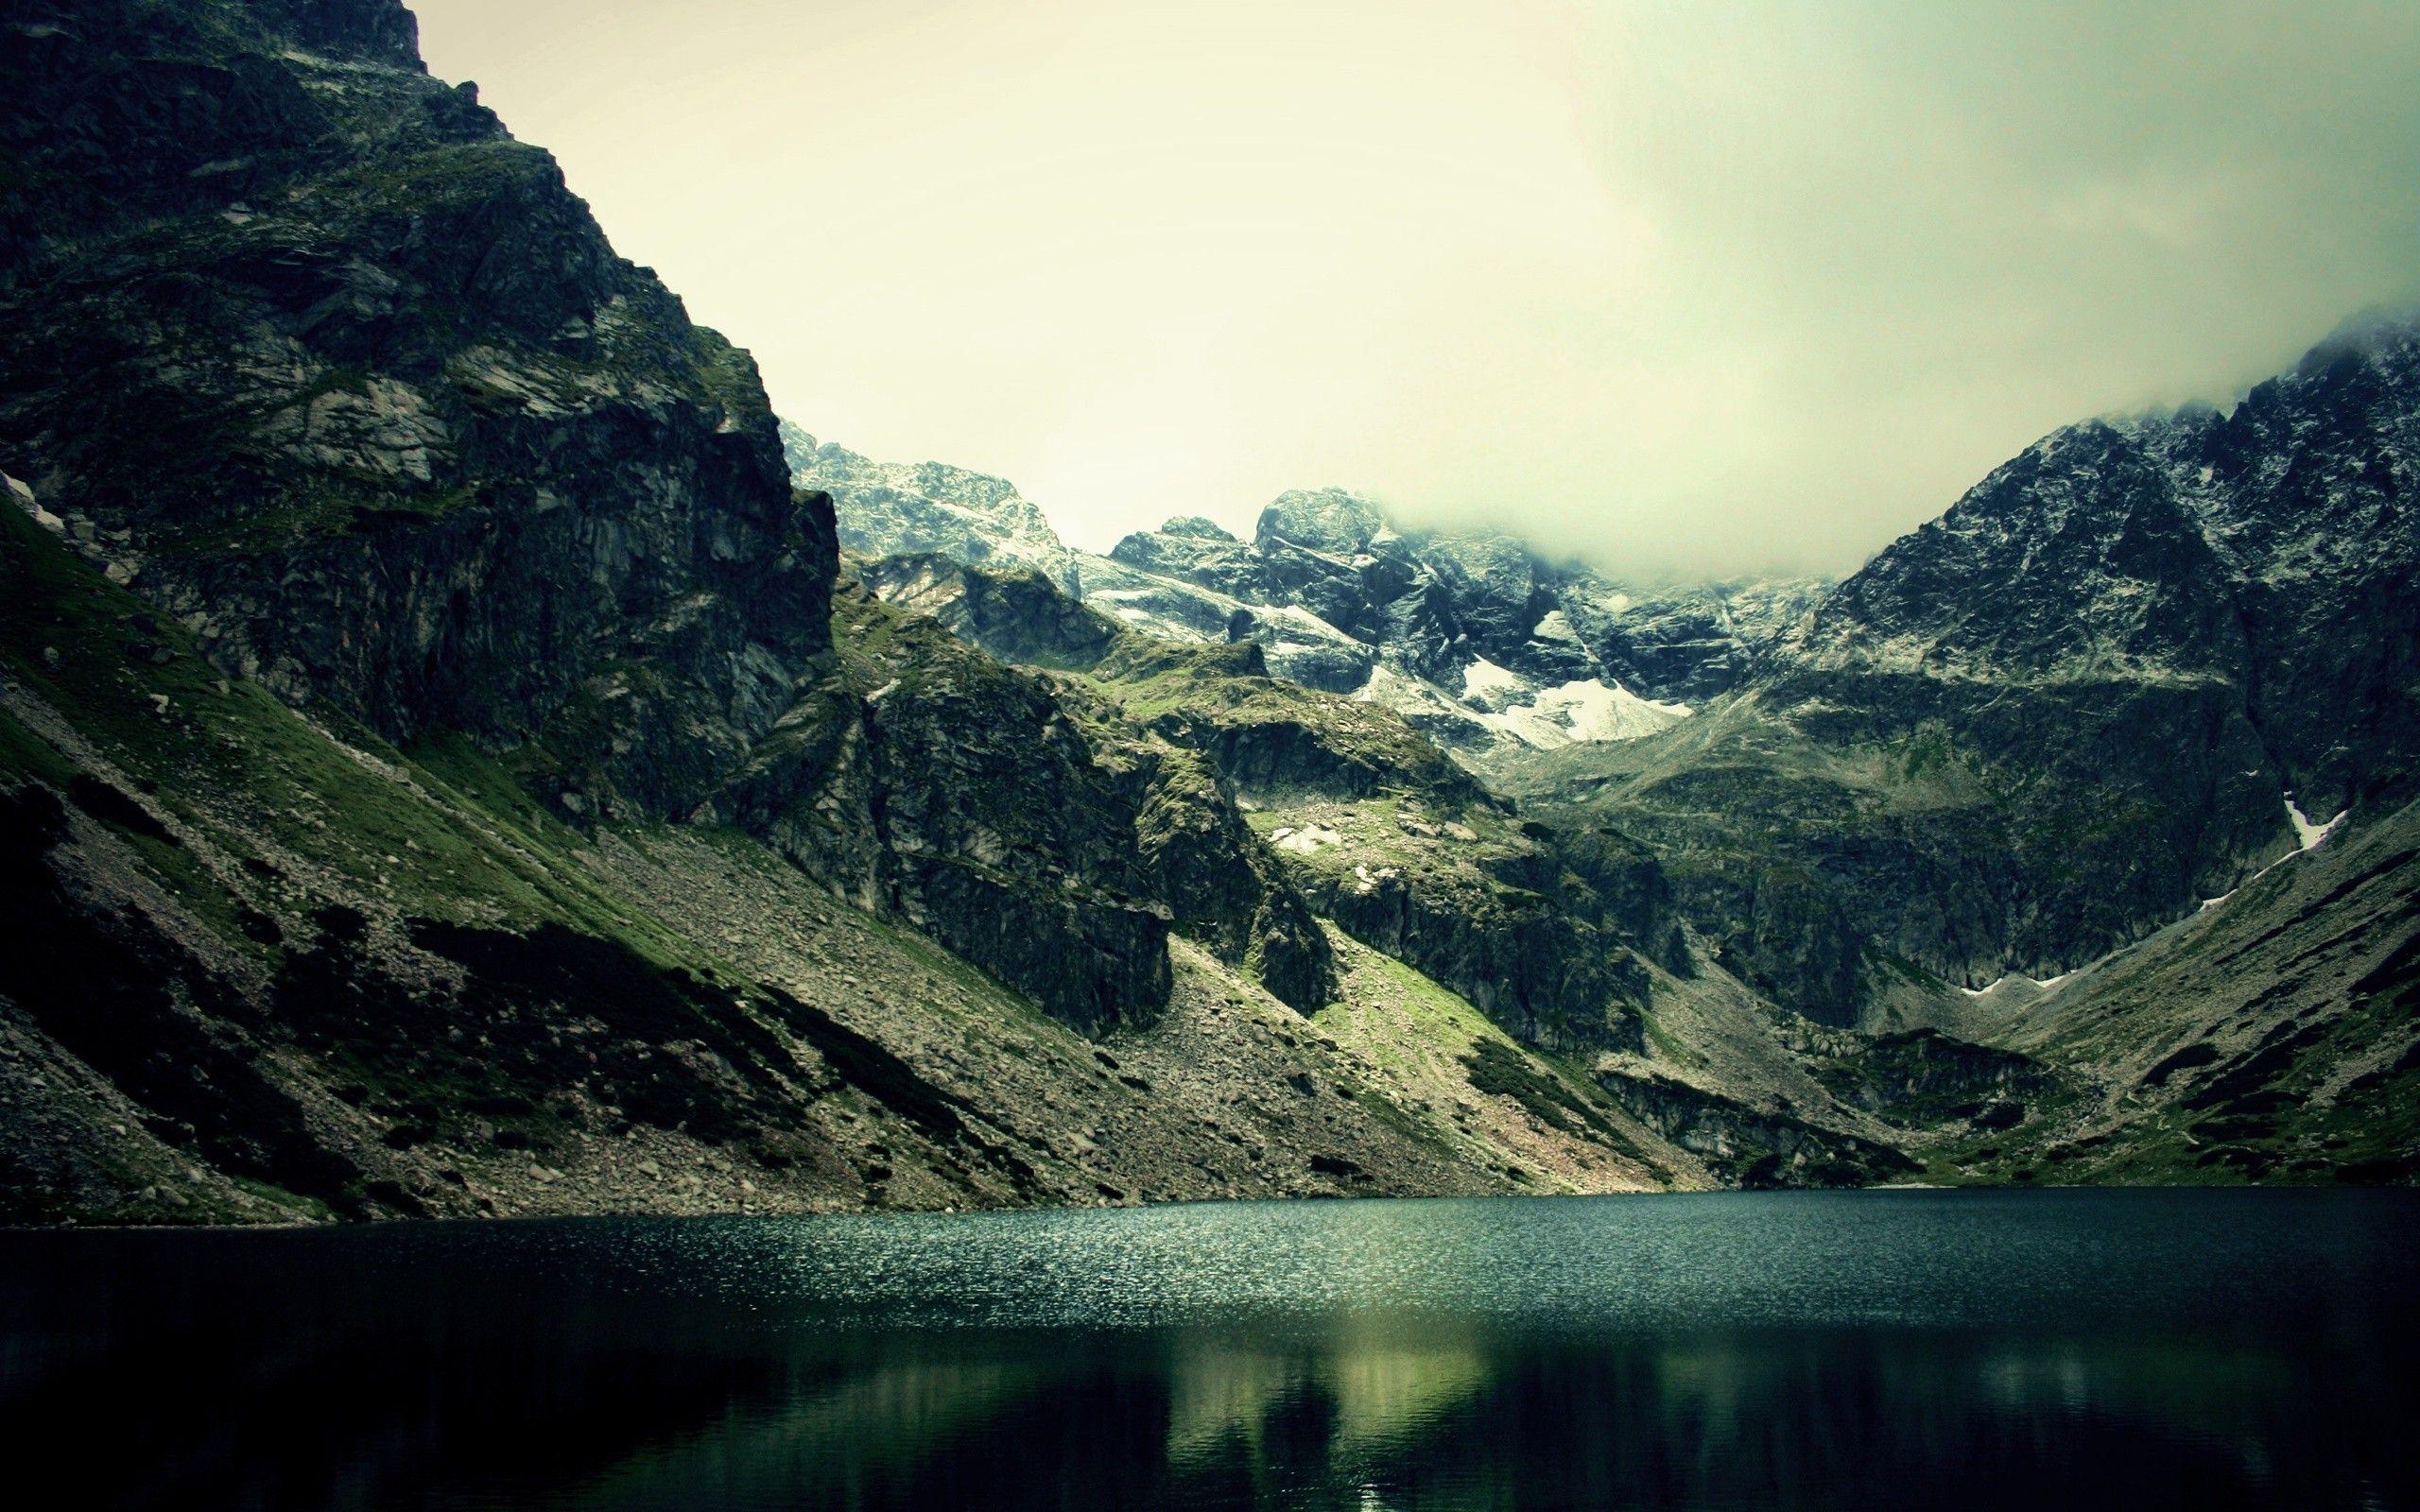 Dark Mountain Lake Nature Wallpaper 2560x1600 px Free ...